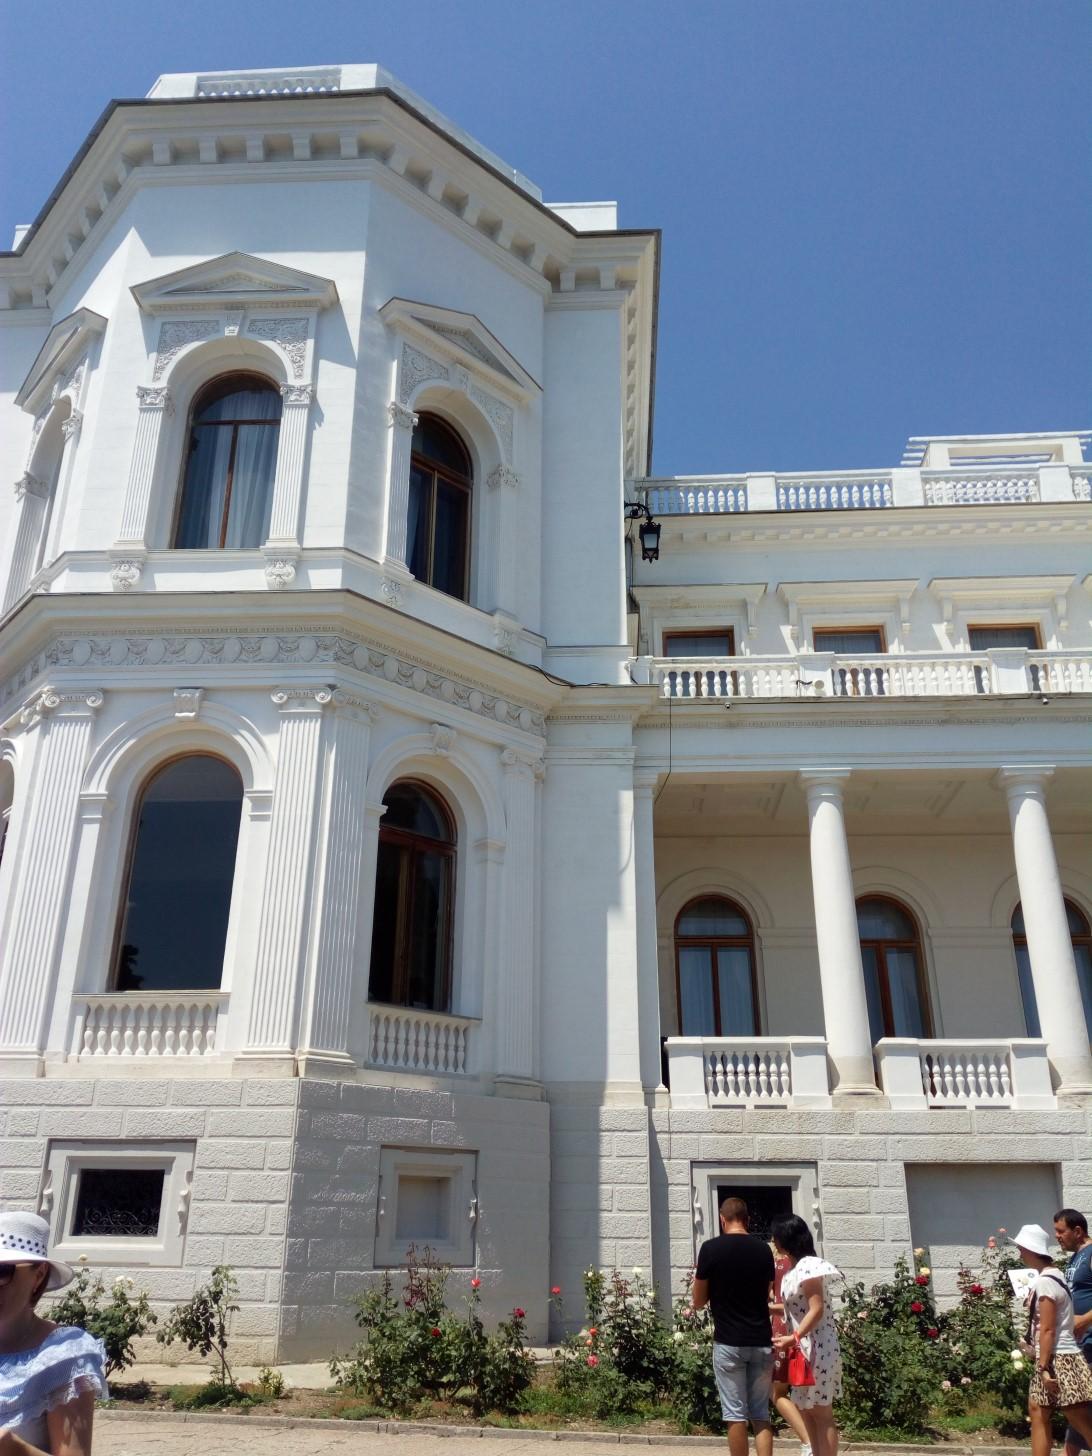 Южный фасад Ливадийского дворца